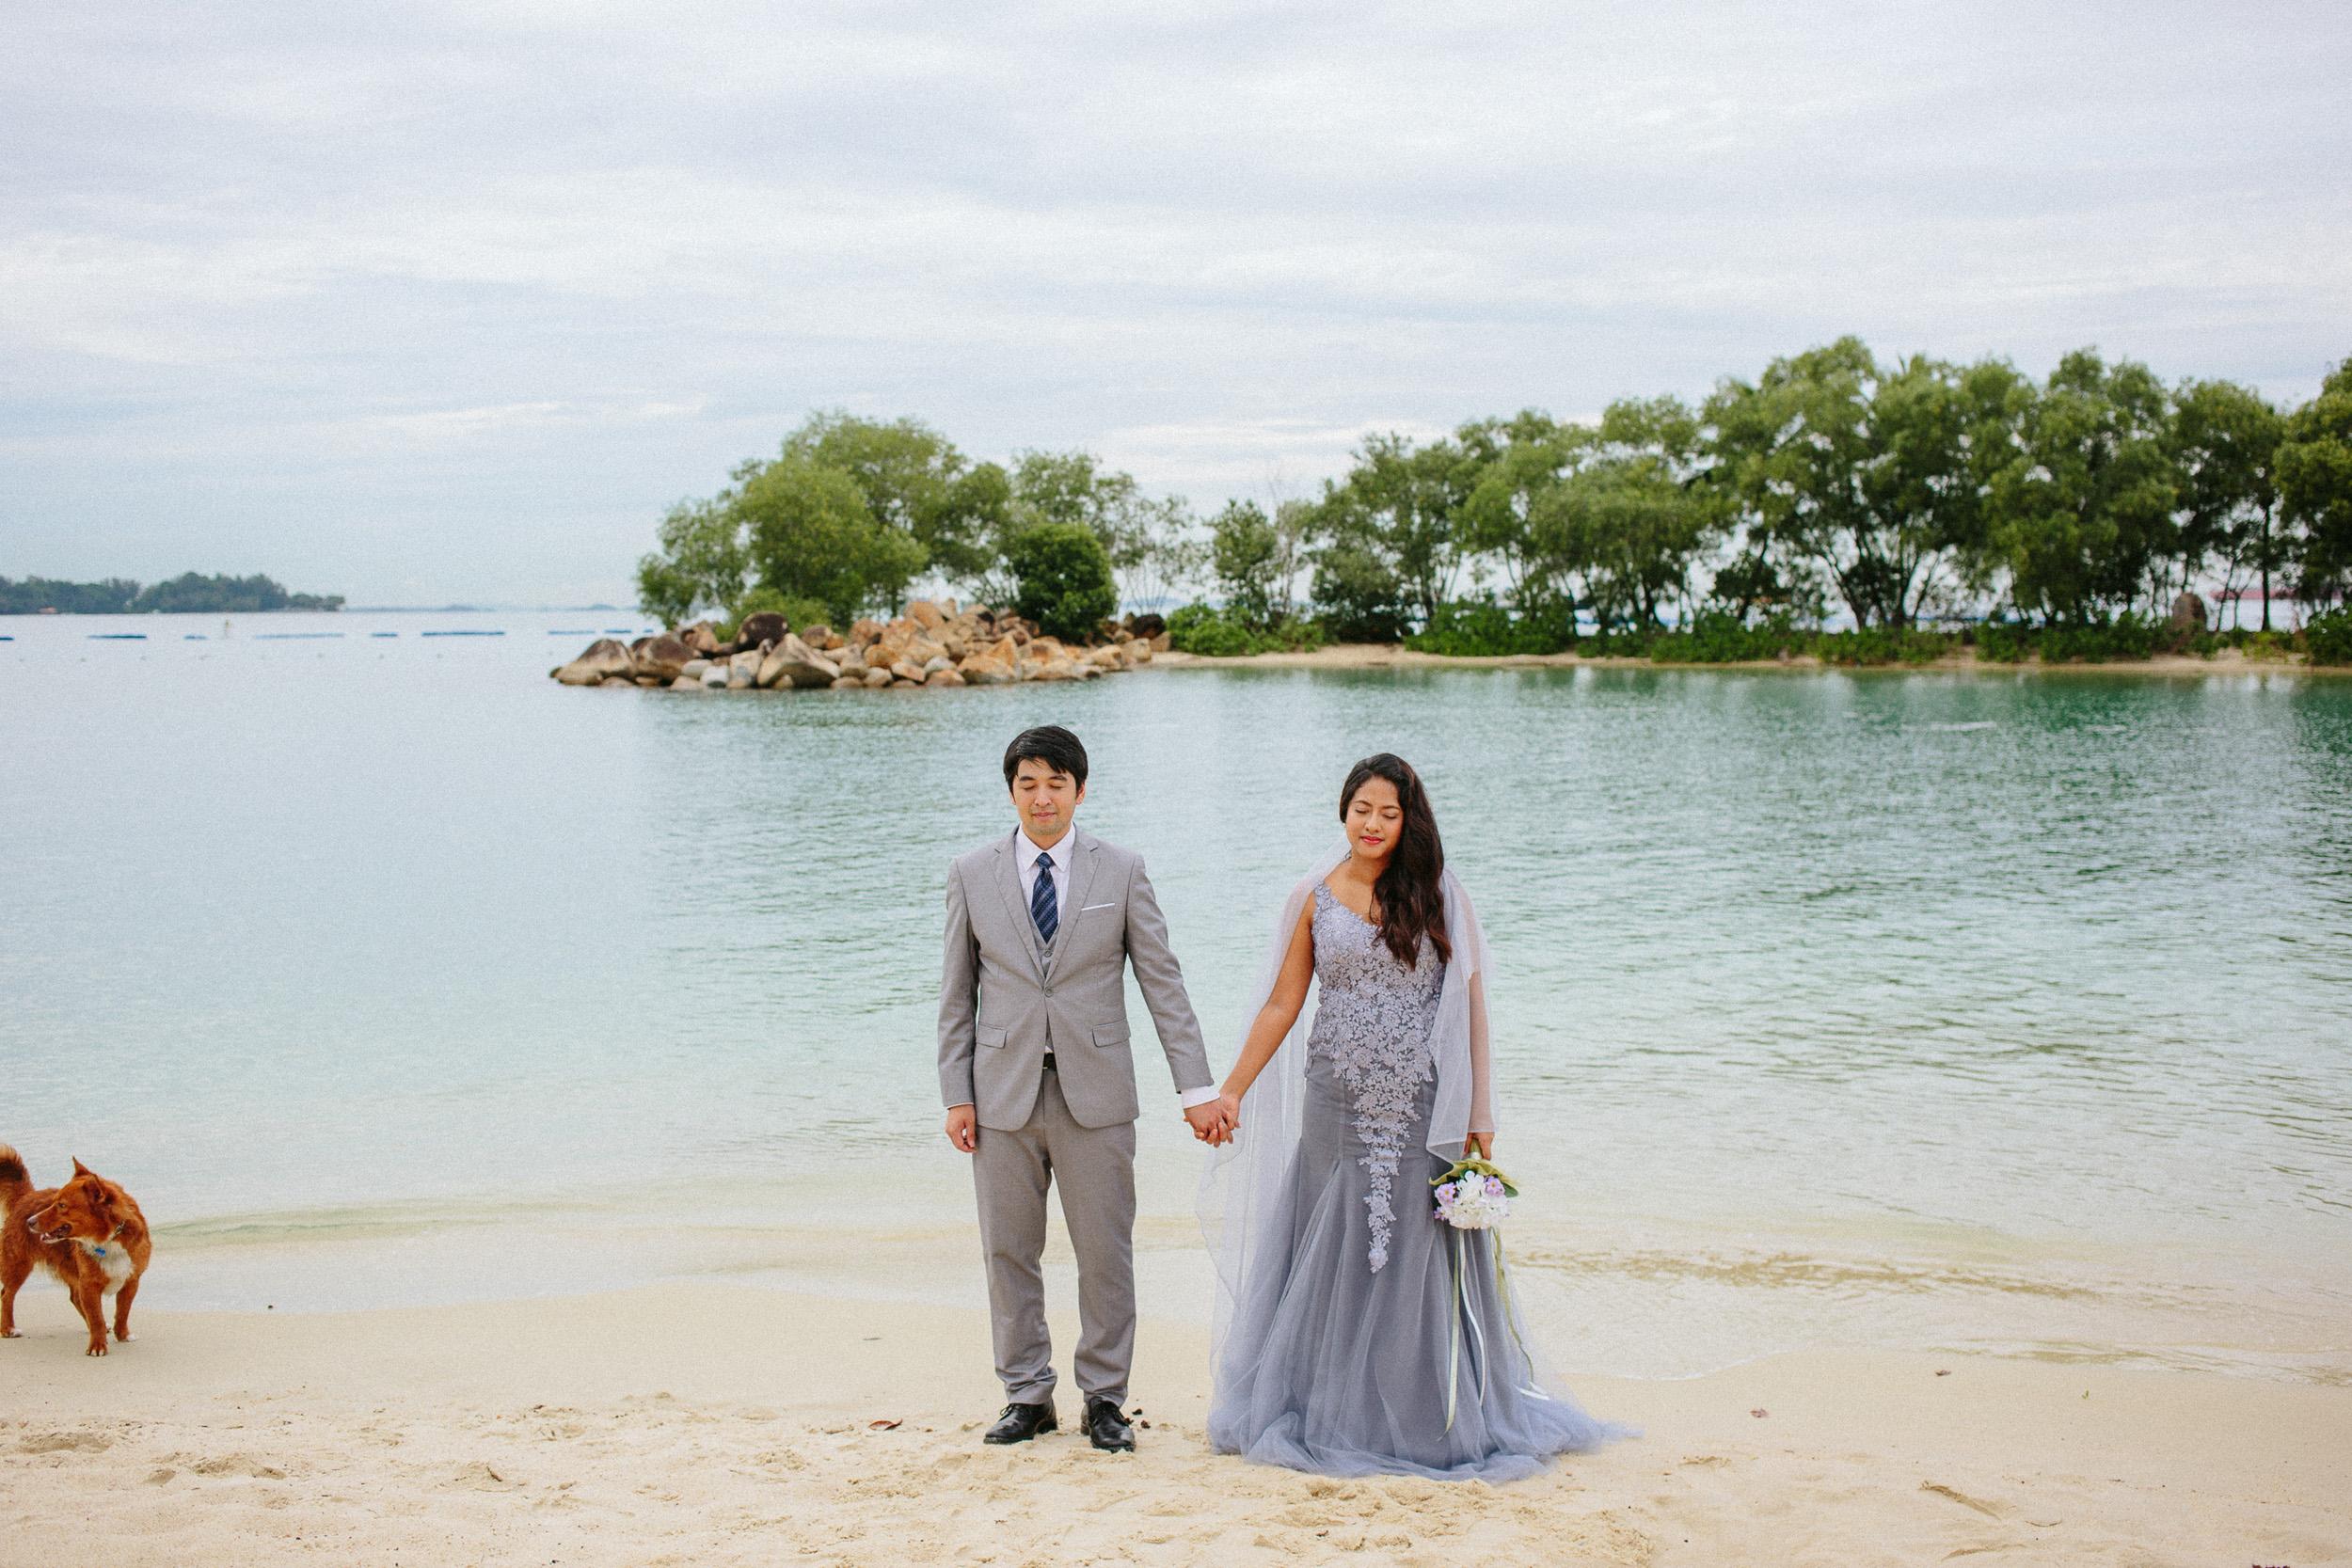 singapore-wedding-photographer-photography-wmt2017-022.jpg